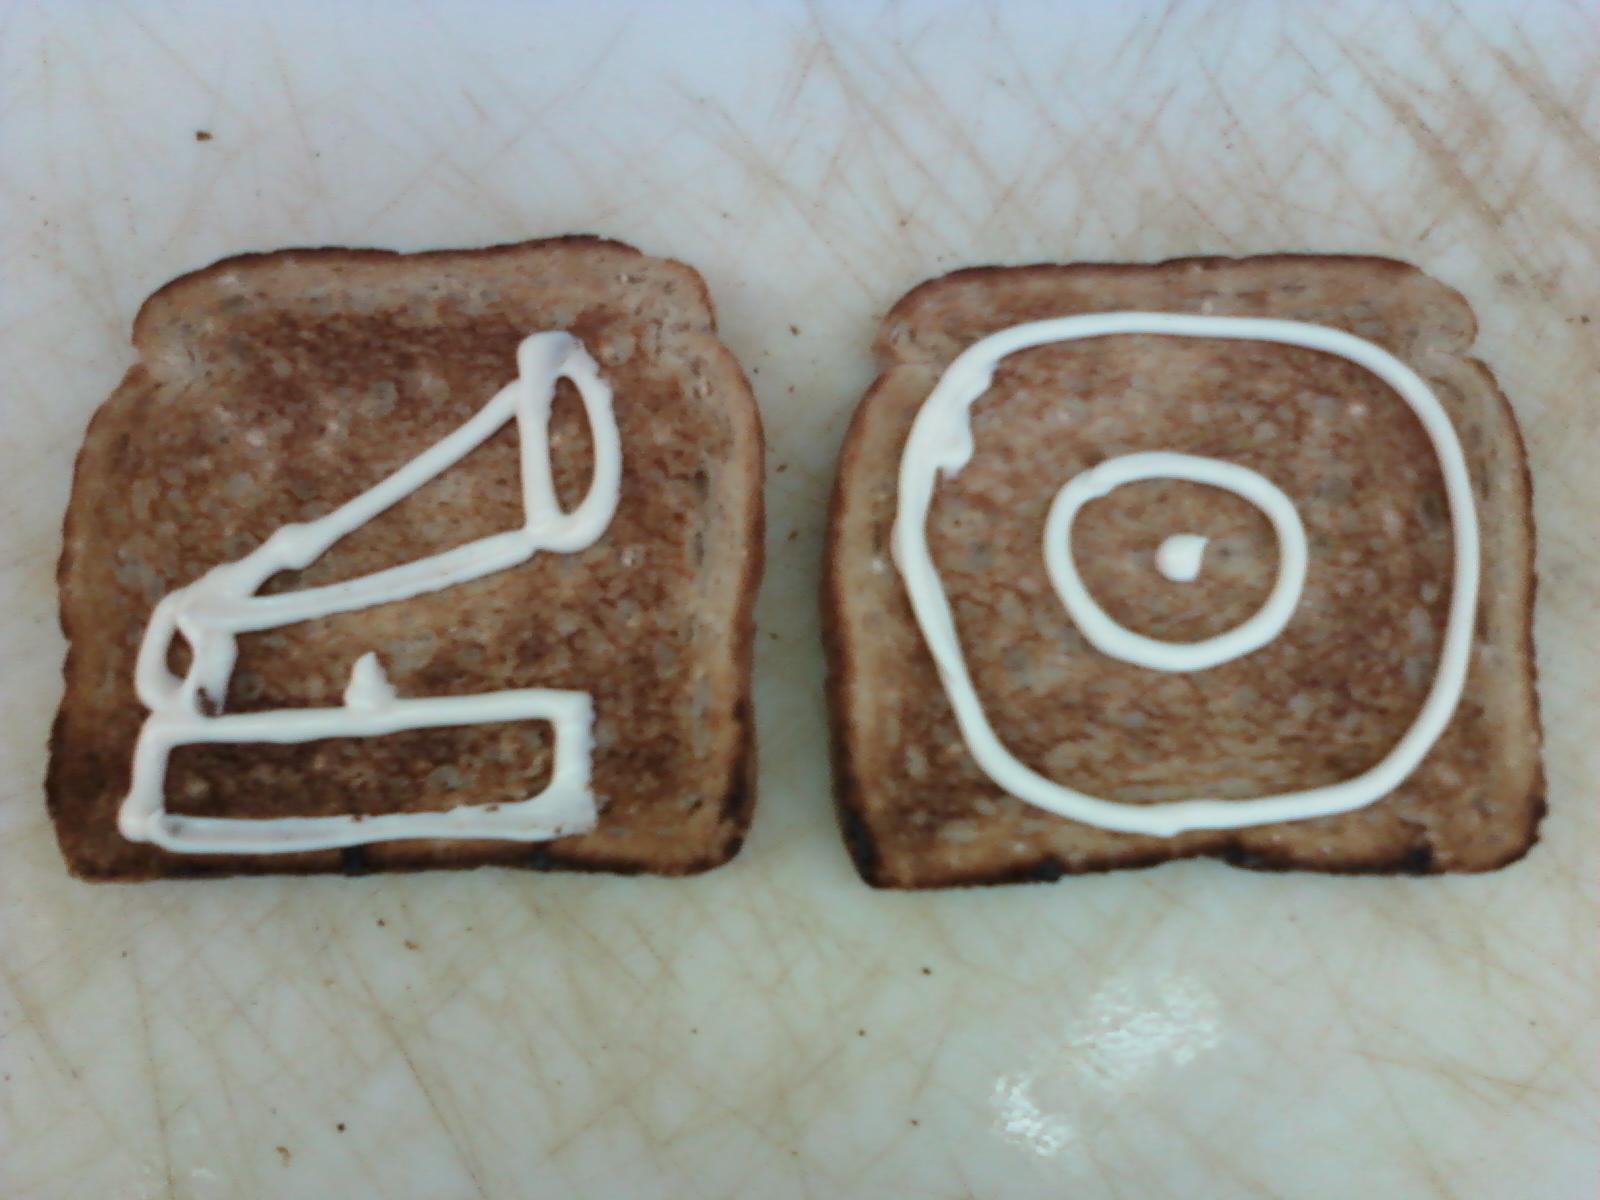 sandwich_art/0731110919.jpg